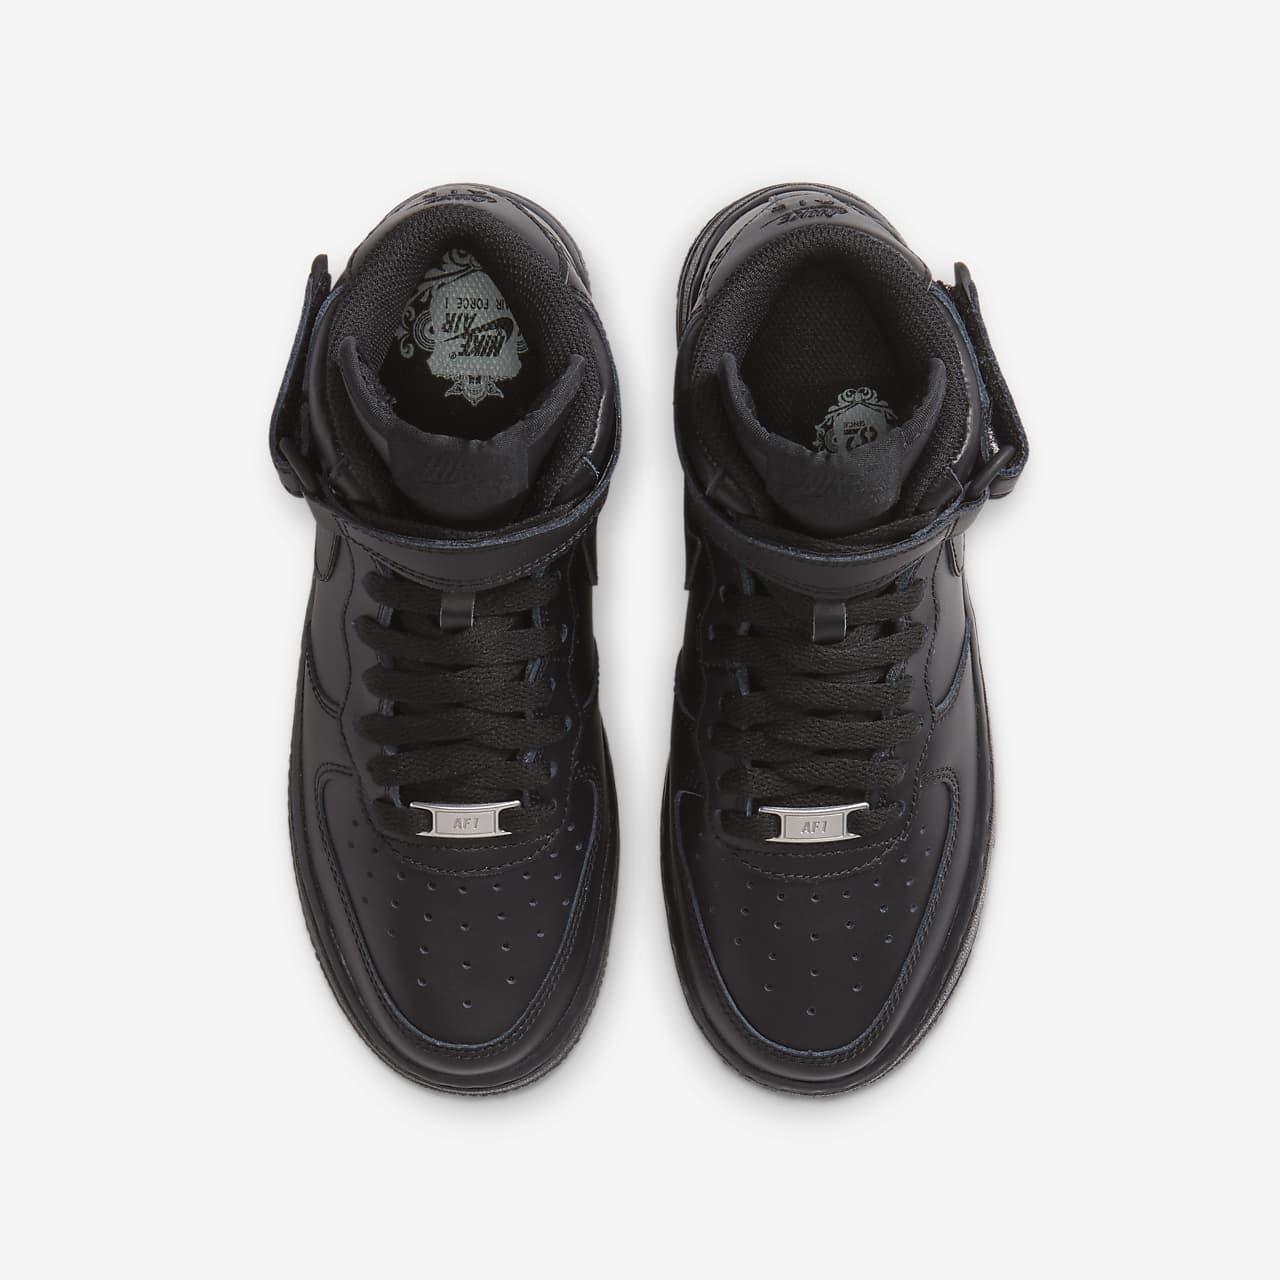 Nike Lifestyle Schuhe Mädchen   Nike Air Force 1 Mid 06